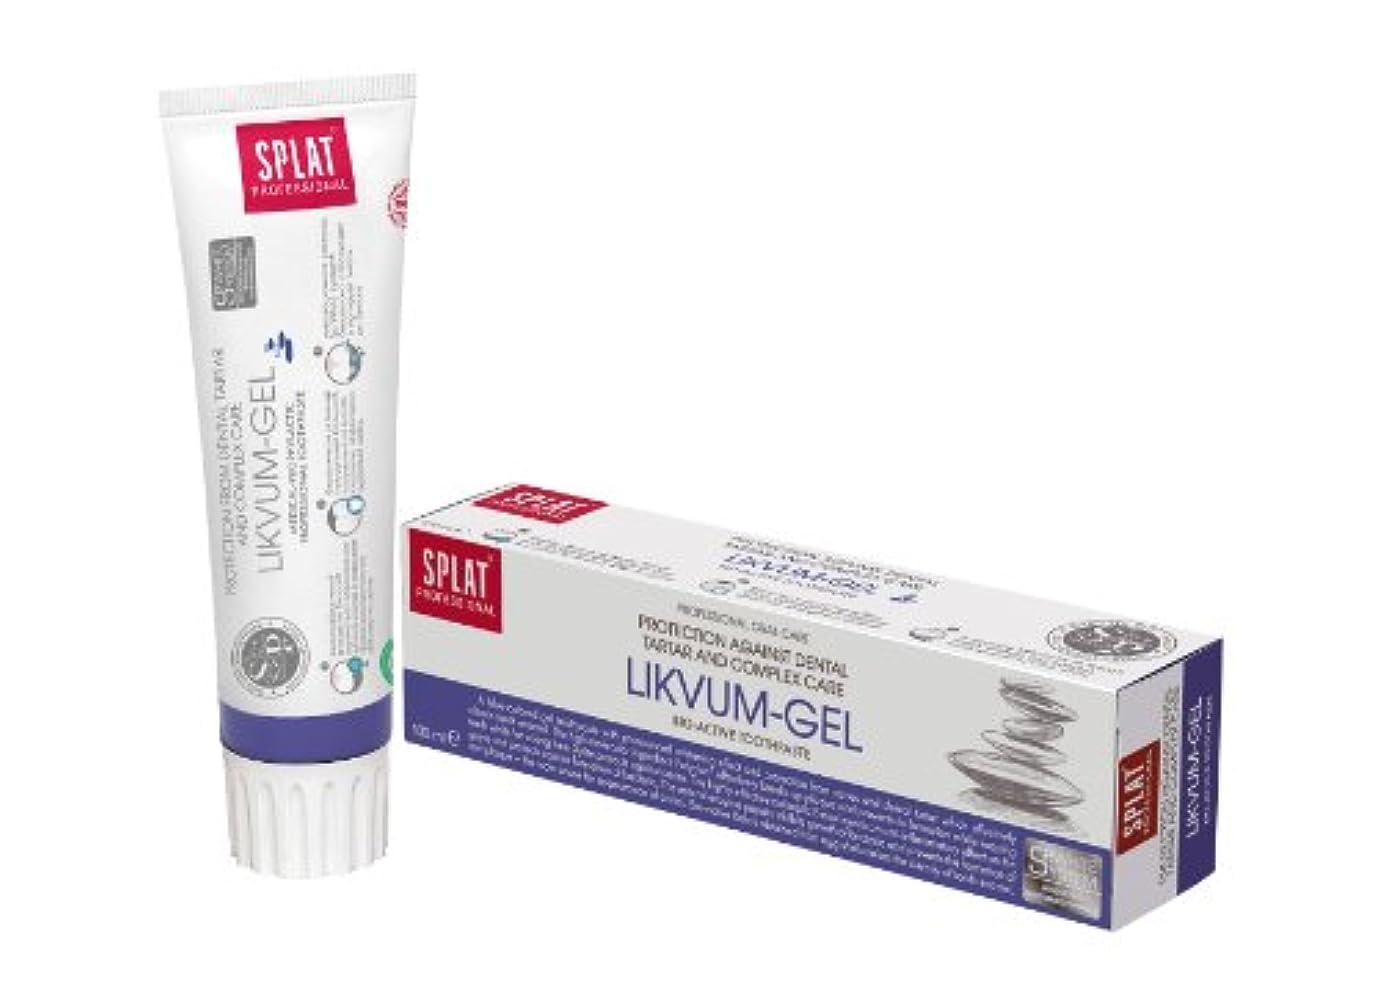 紀元前瀬戸際仕立て屋Toothpaste Splat Professional 100ml (Likvum-gel)